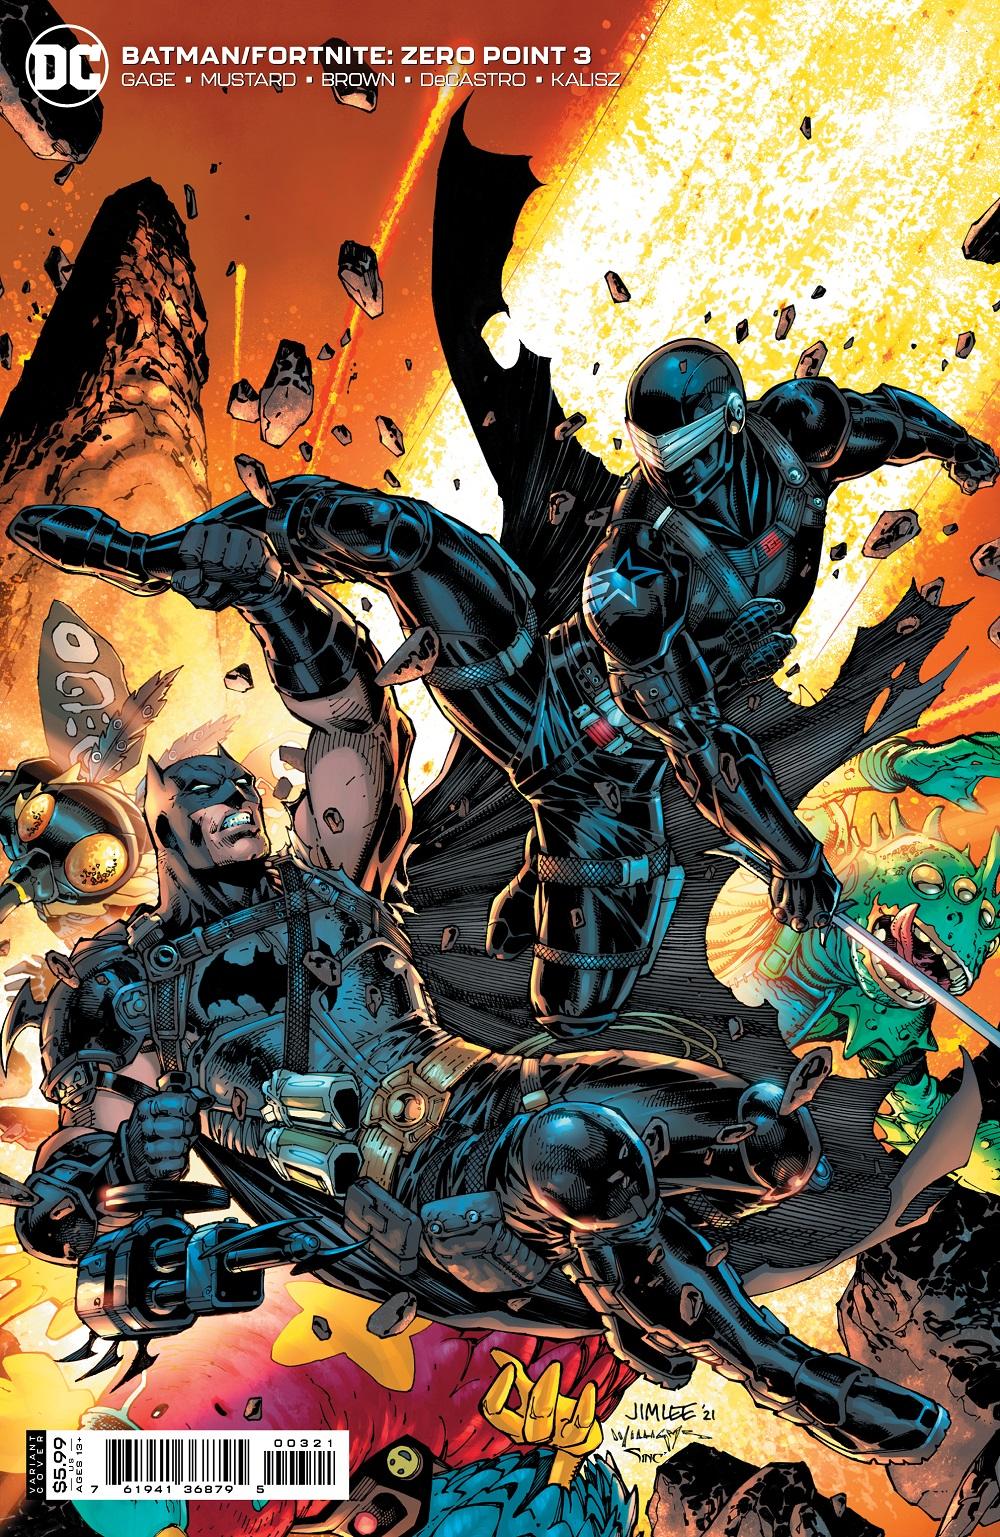 0221DC810 ComicList: DC Comics New Releases for 05/19/2021